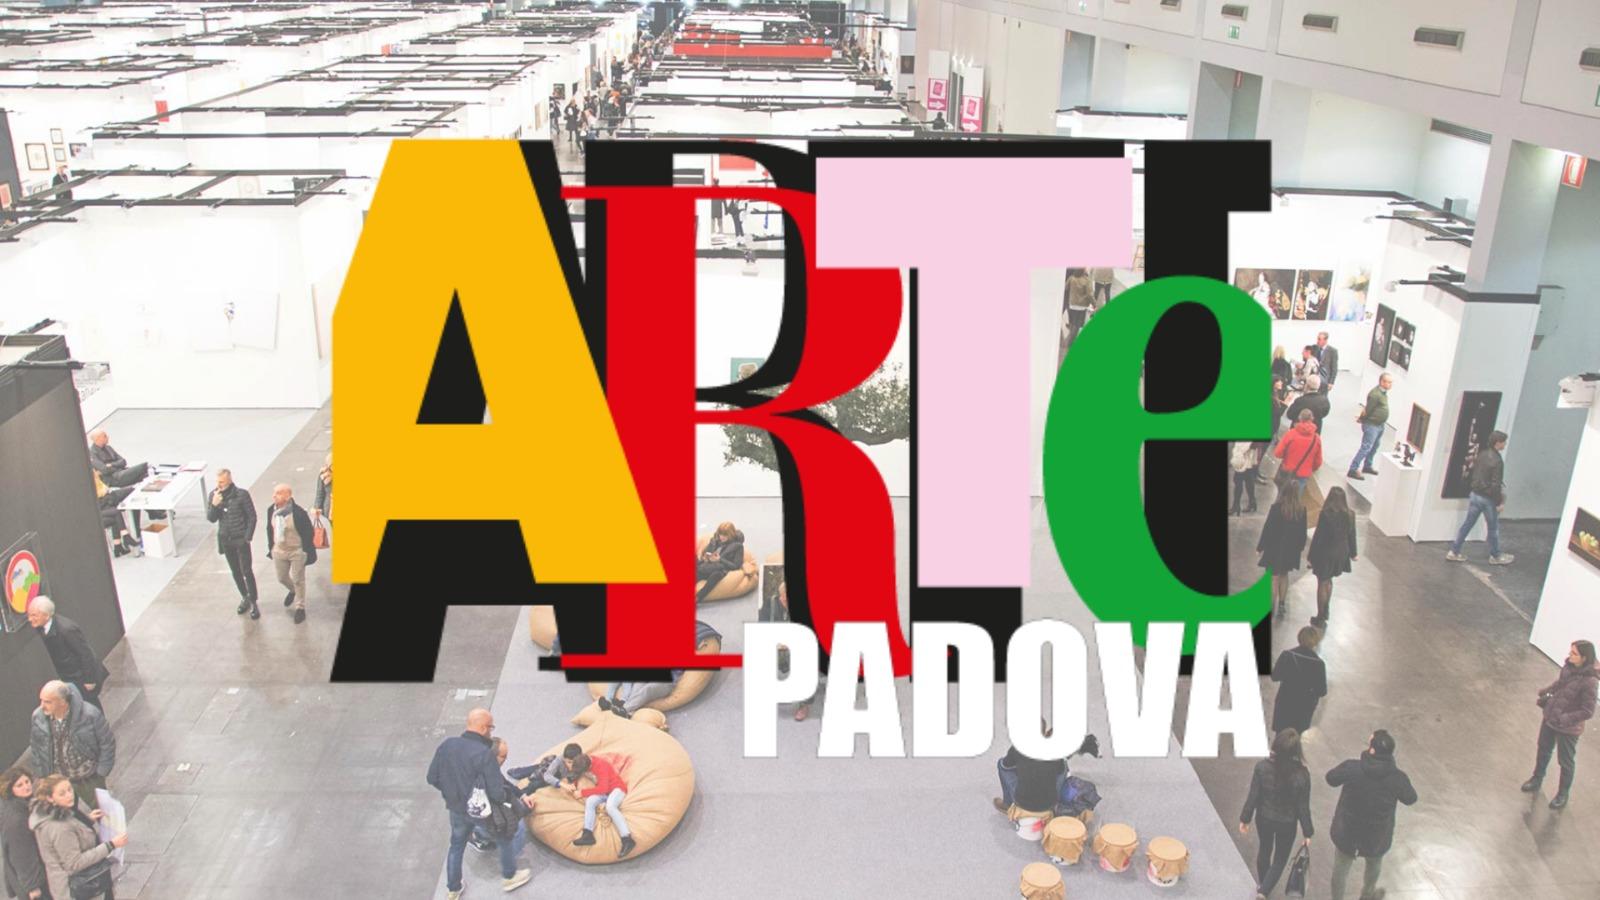 Arte Padova 2019 - Deodato Arte participe à la foire d'art